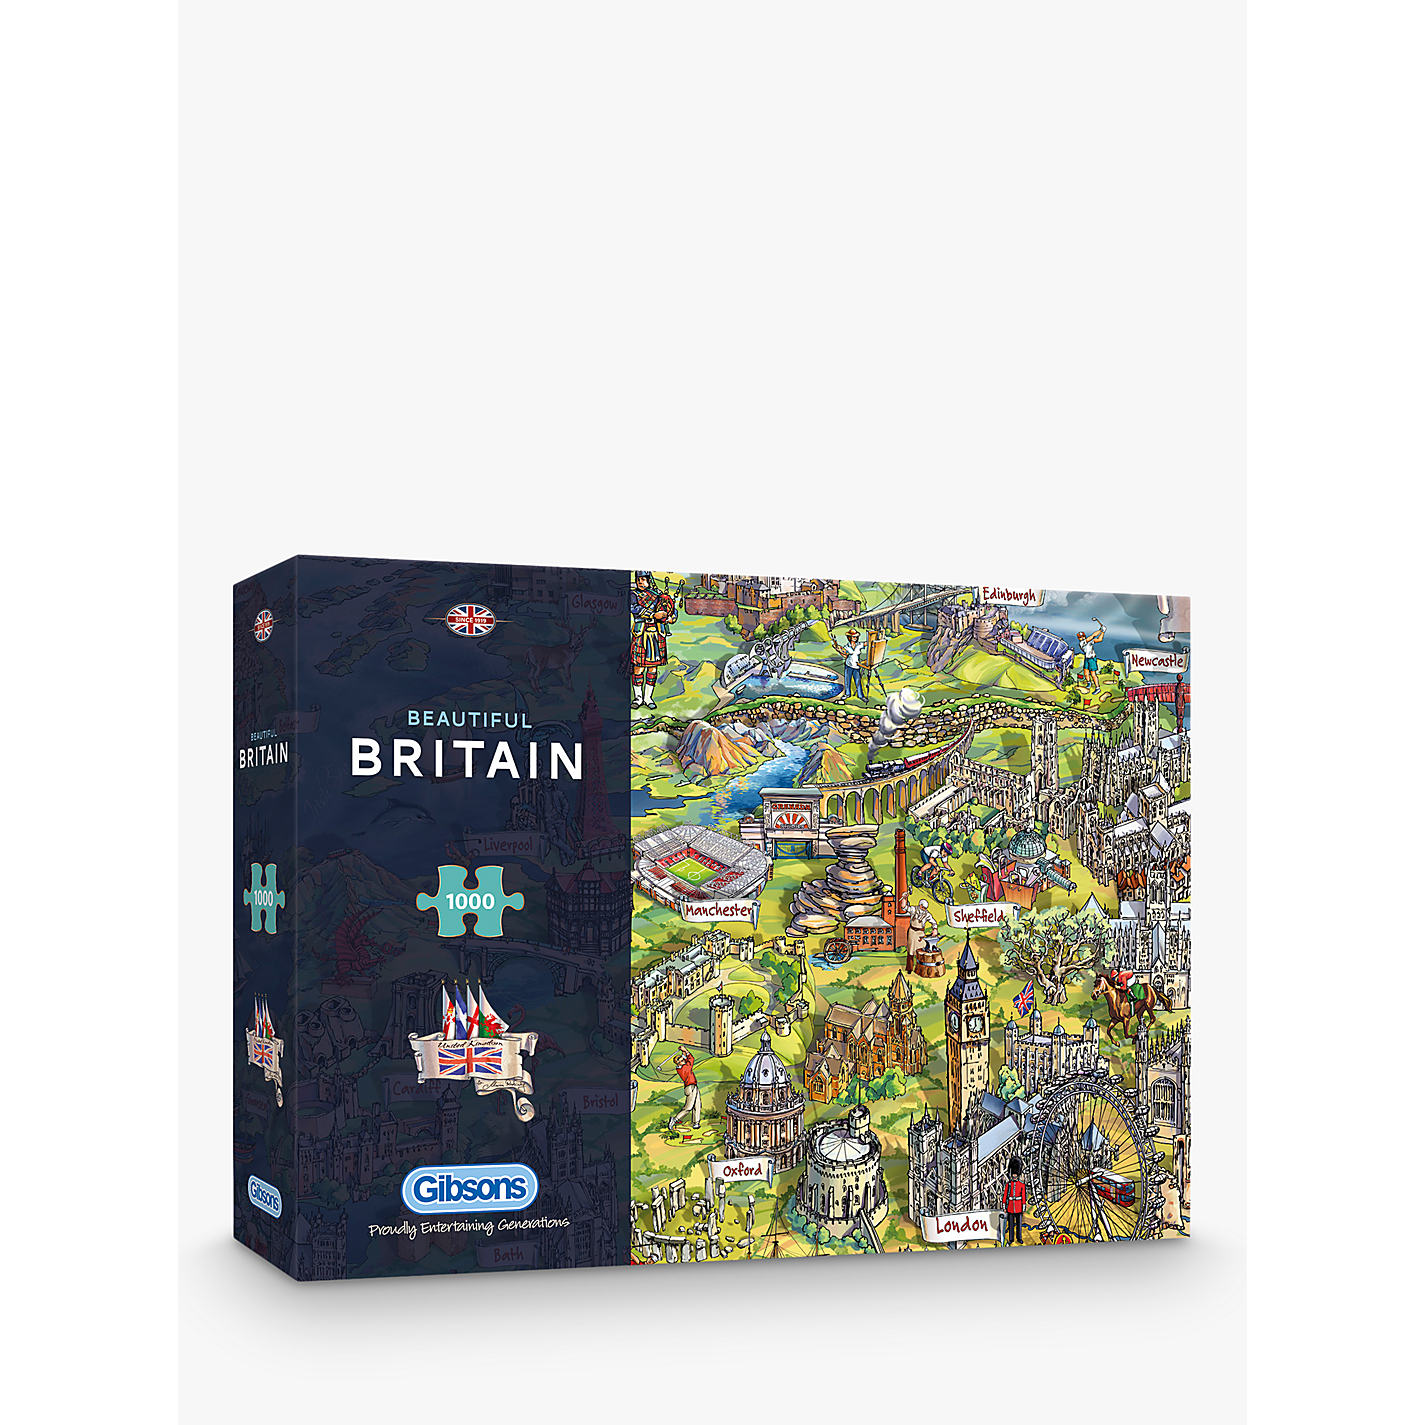 Buy gibsons beautiful britain uk map jigsaw puzzle 1000 pieces buy gibsons beautiful britain uk map jigsaw puzzle 1000 pieces online at johnlewis gumiabroncs Gallery